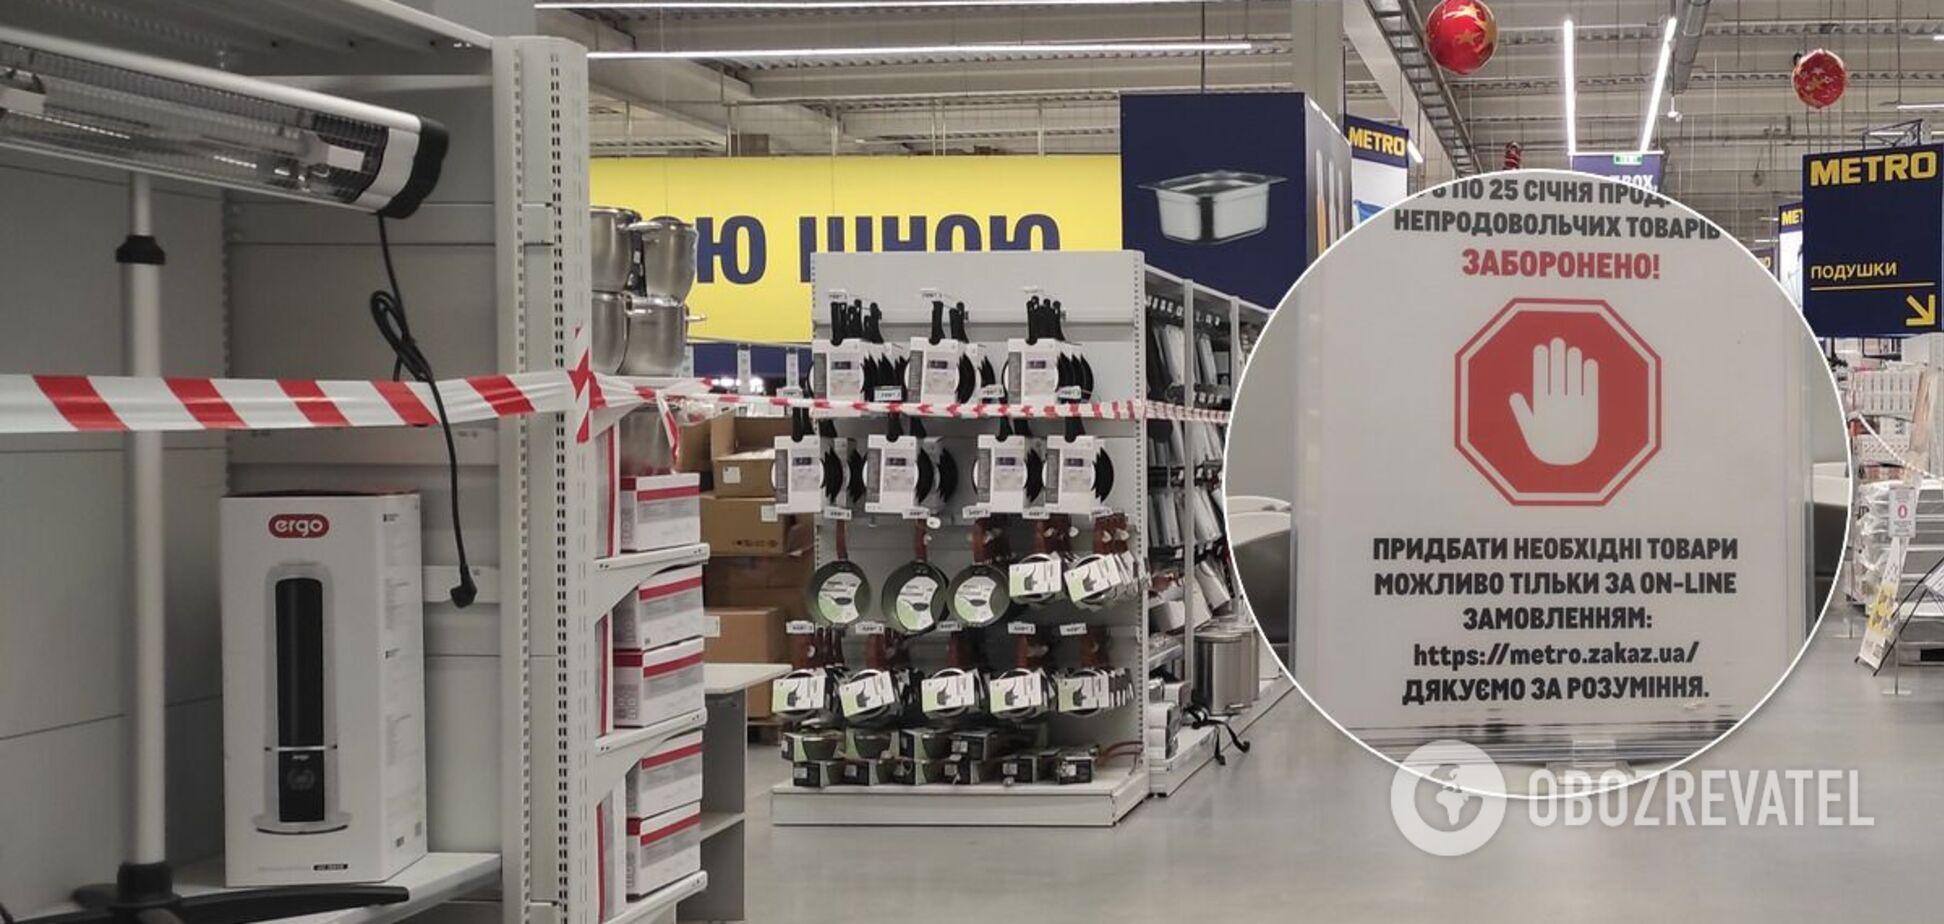 Супермаркеты продают 'запрещенные' товары on-line